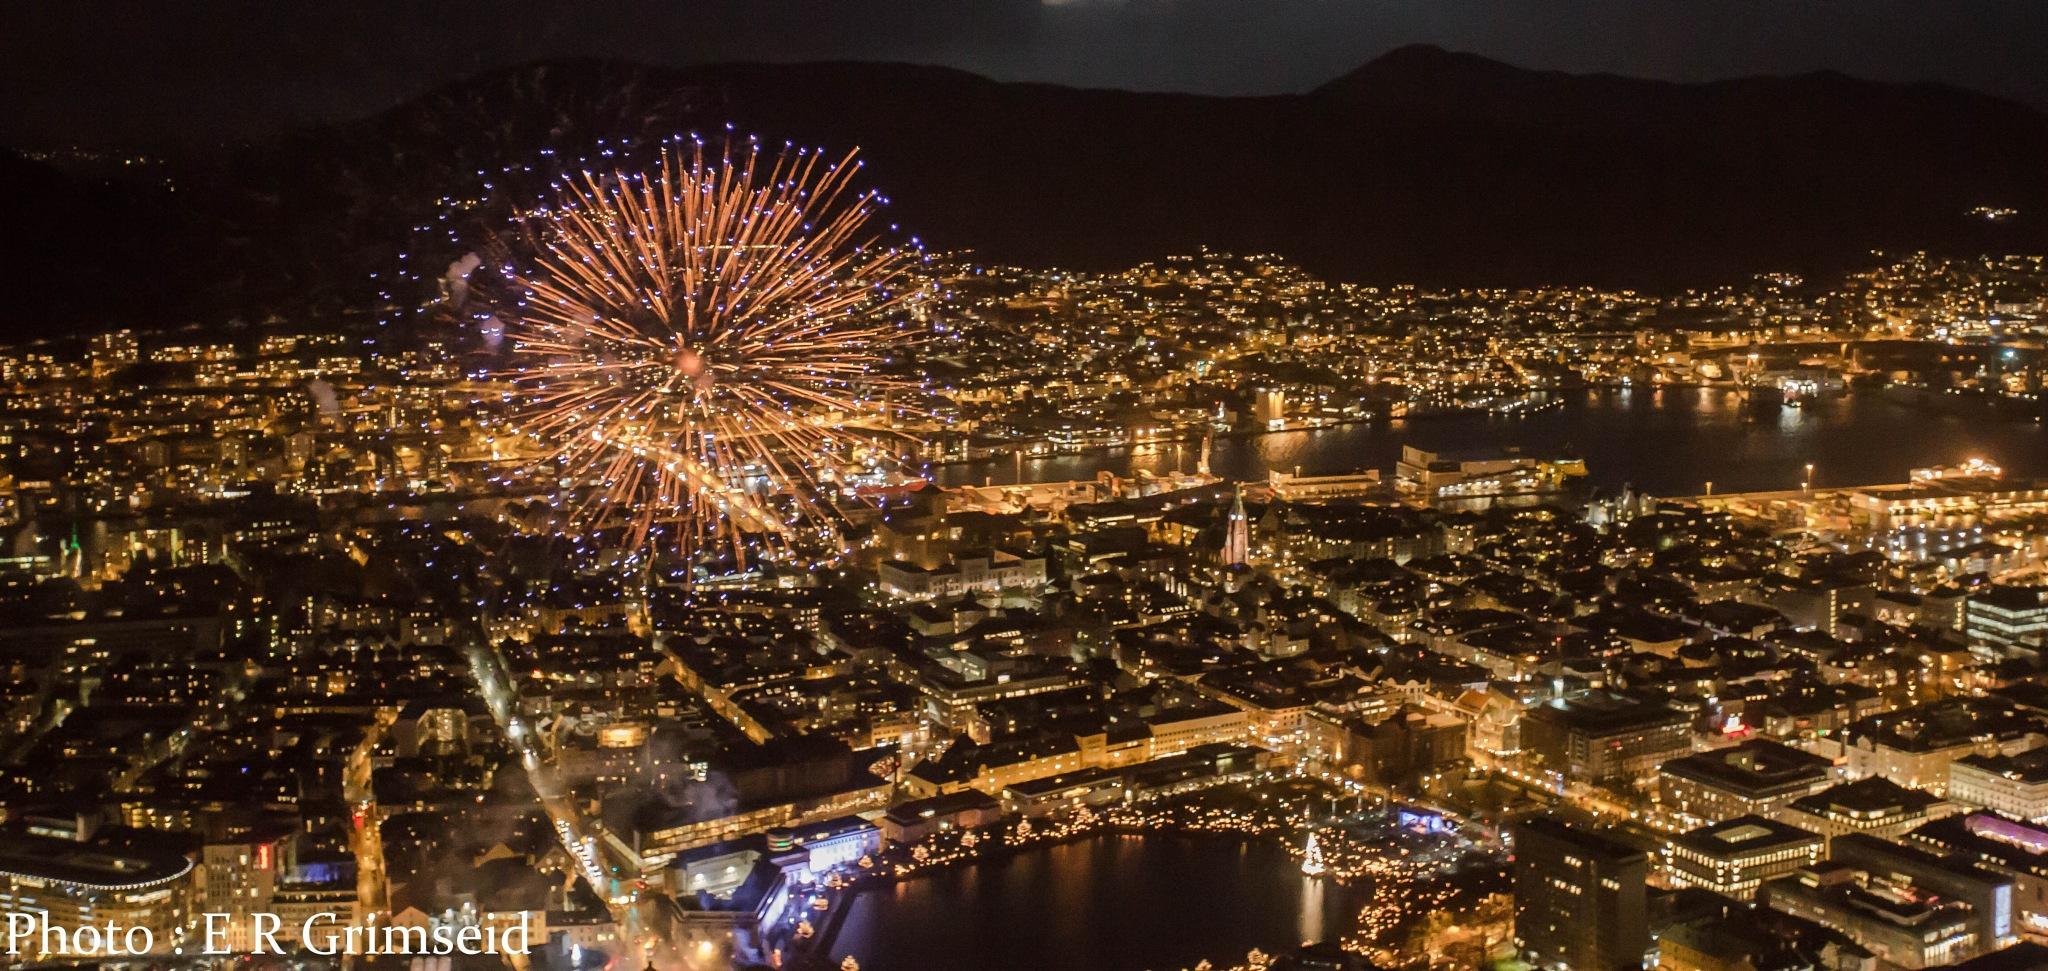 Bergen Festival of Light by Espen Rune Grimseid